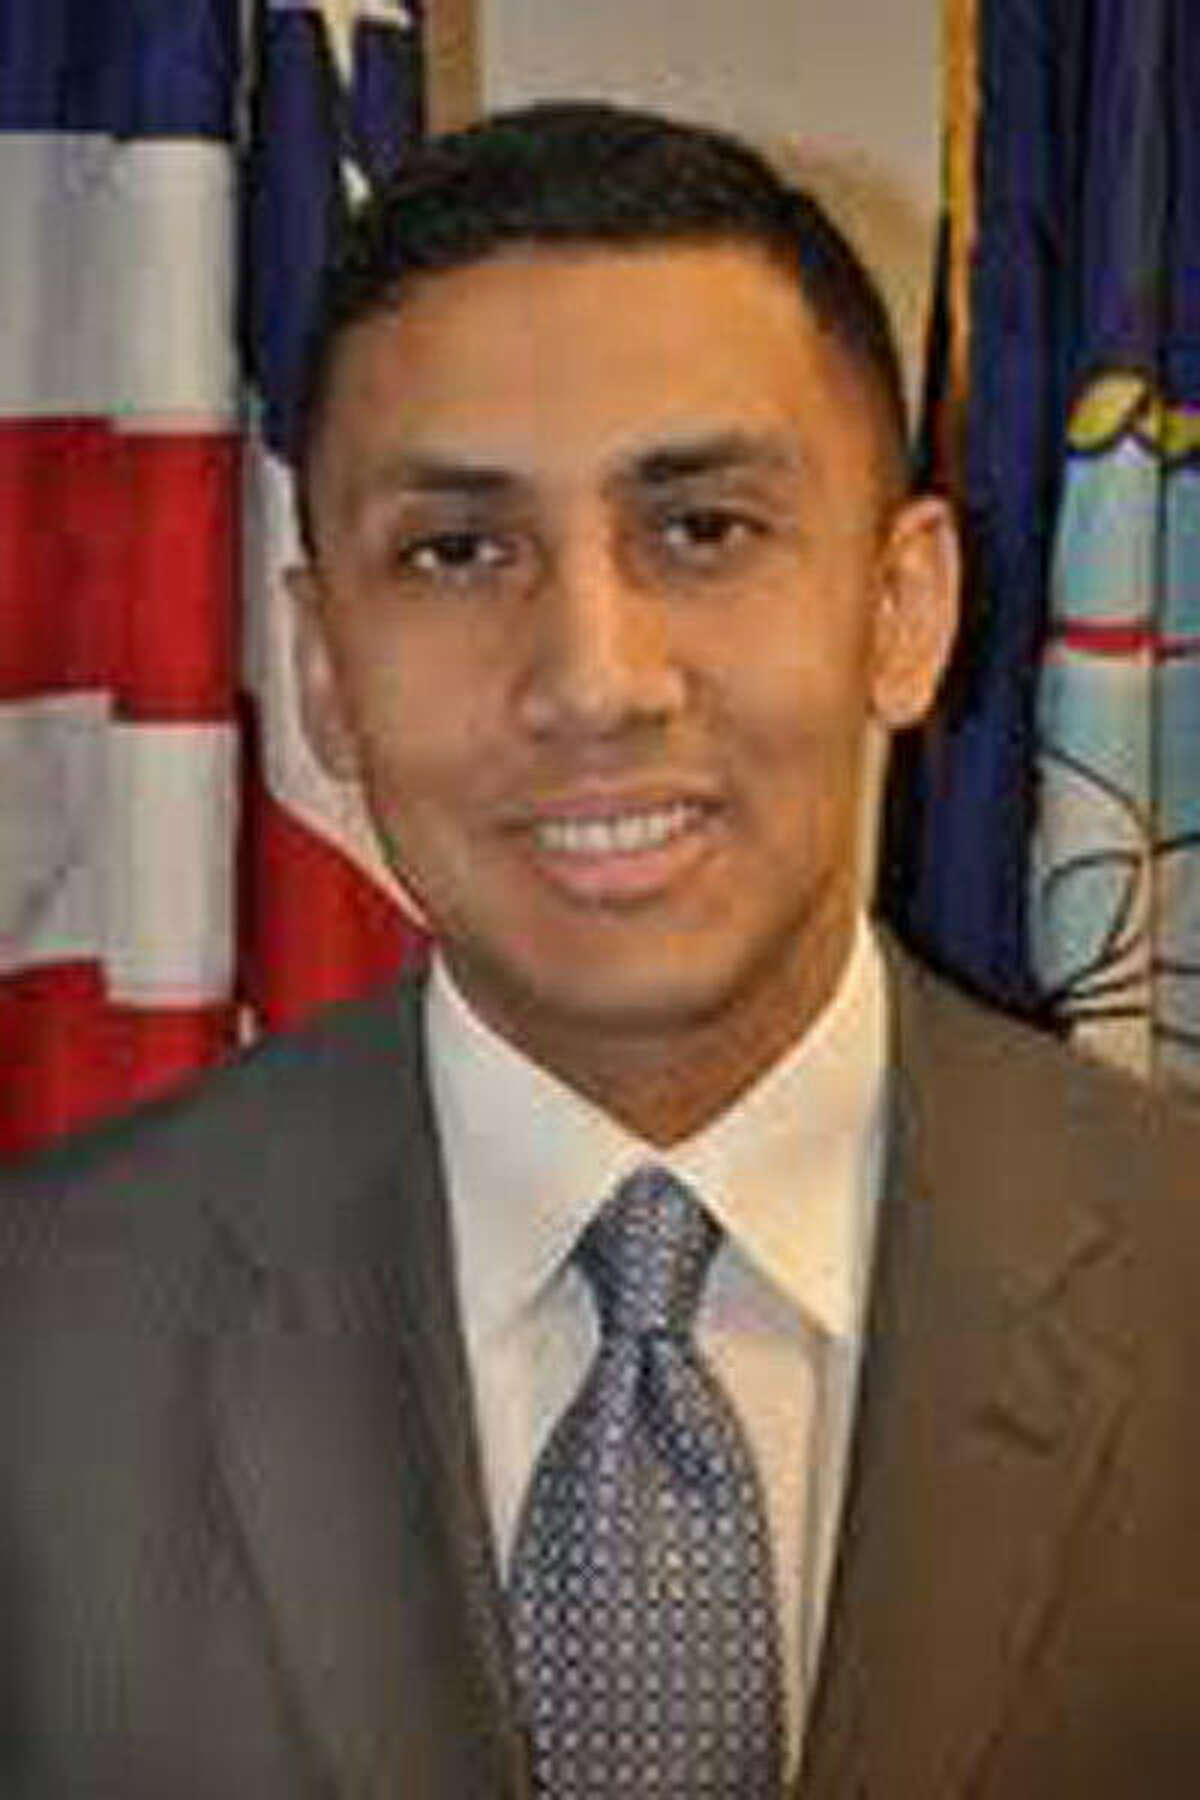 Cris Medina represents San Antonio's City Council District 7.